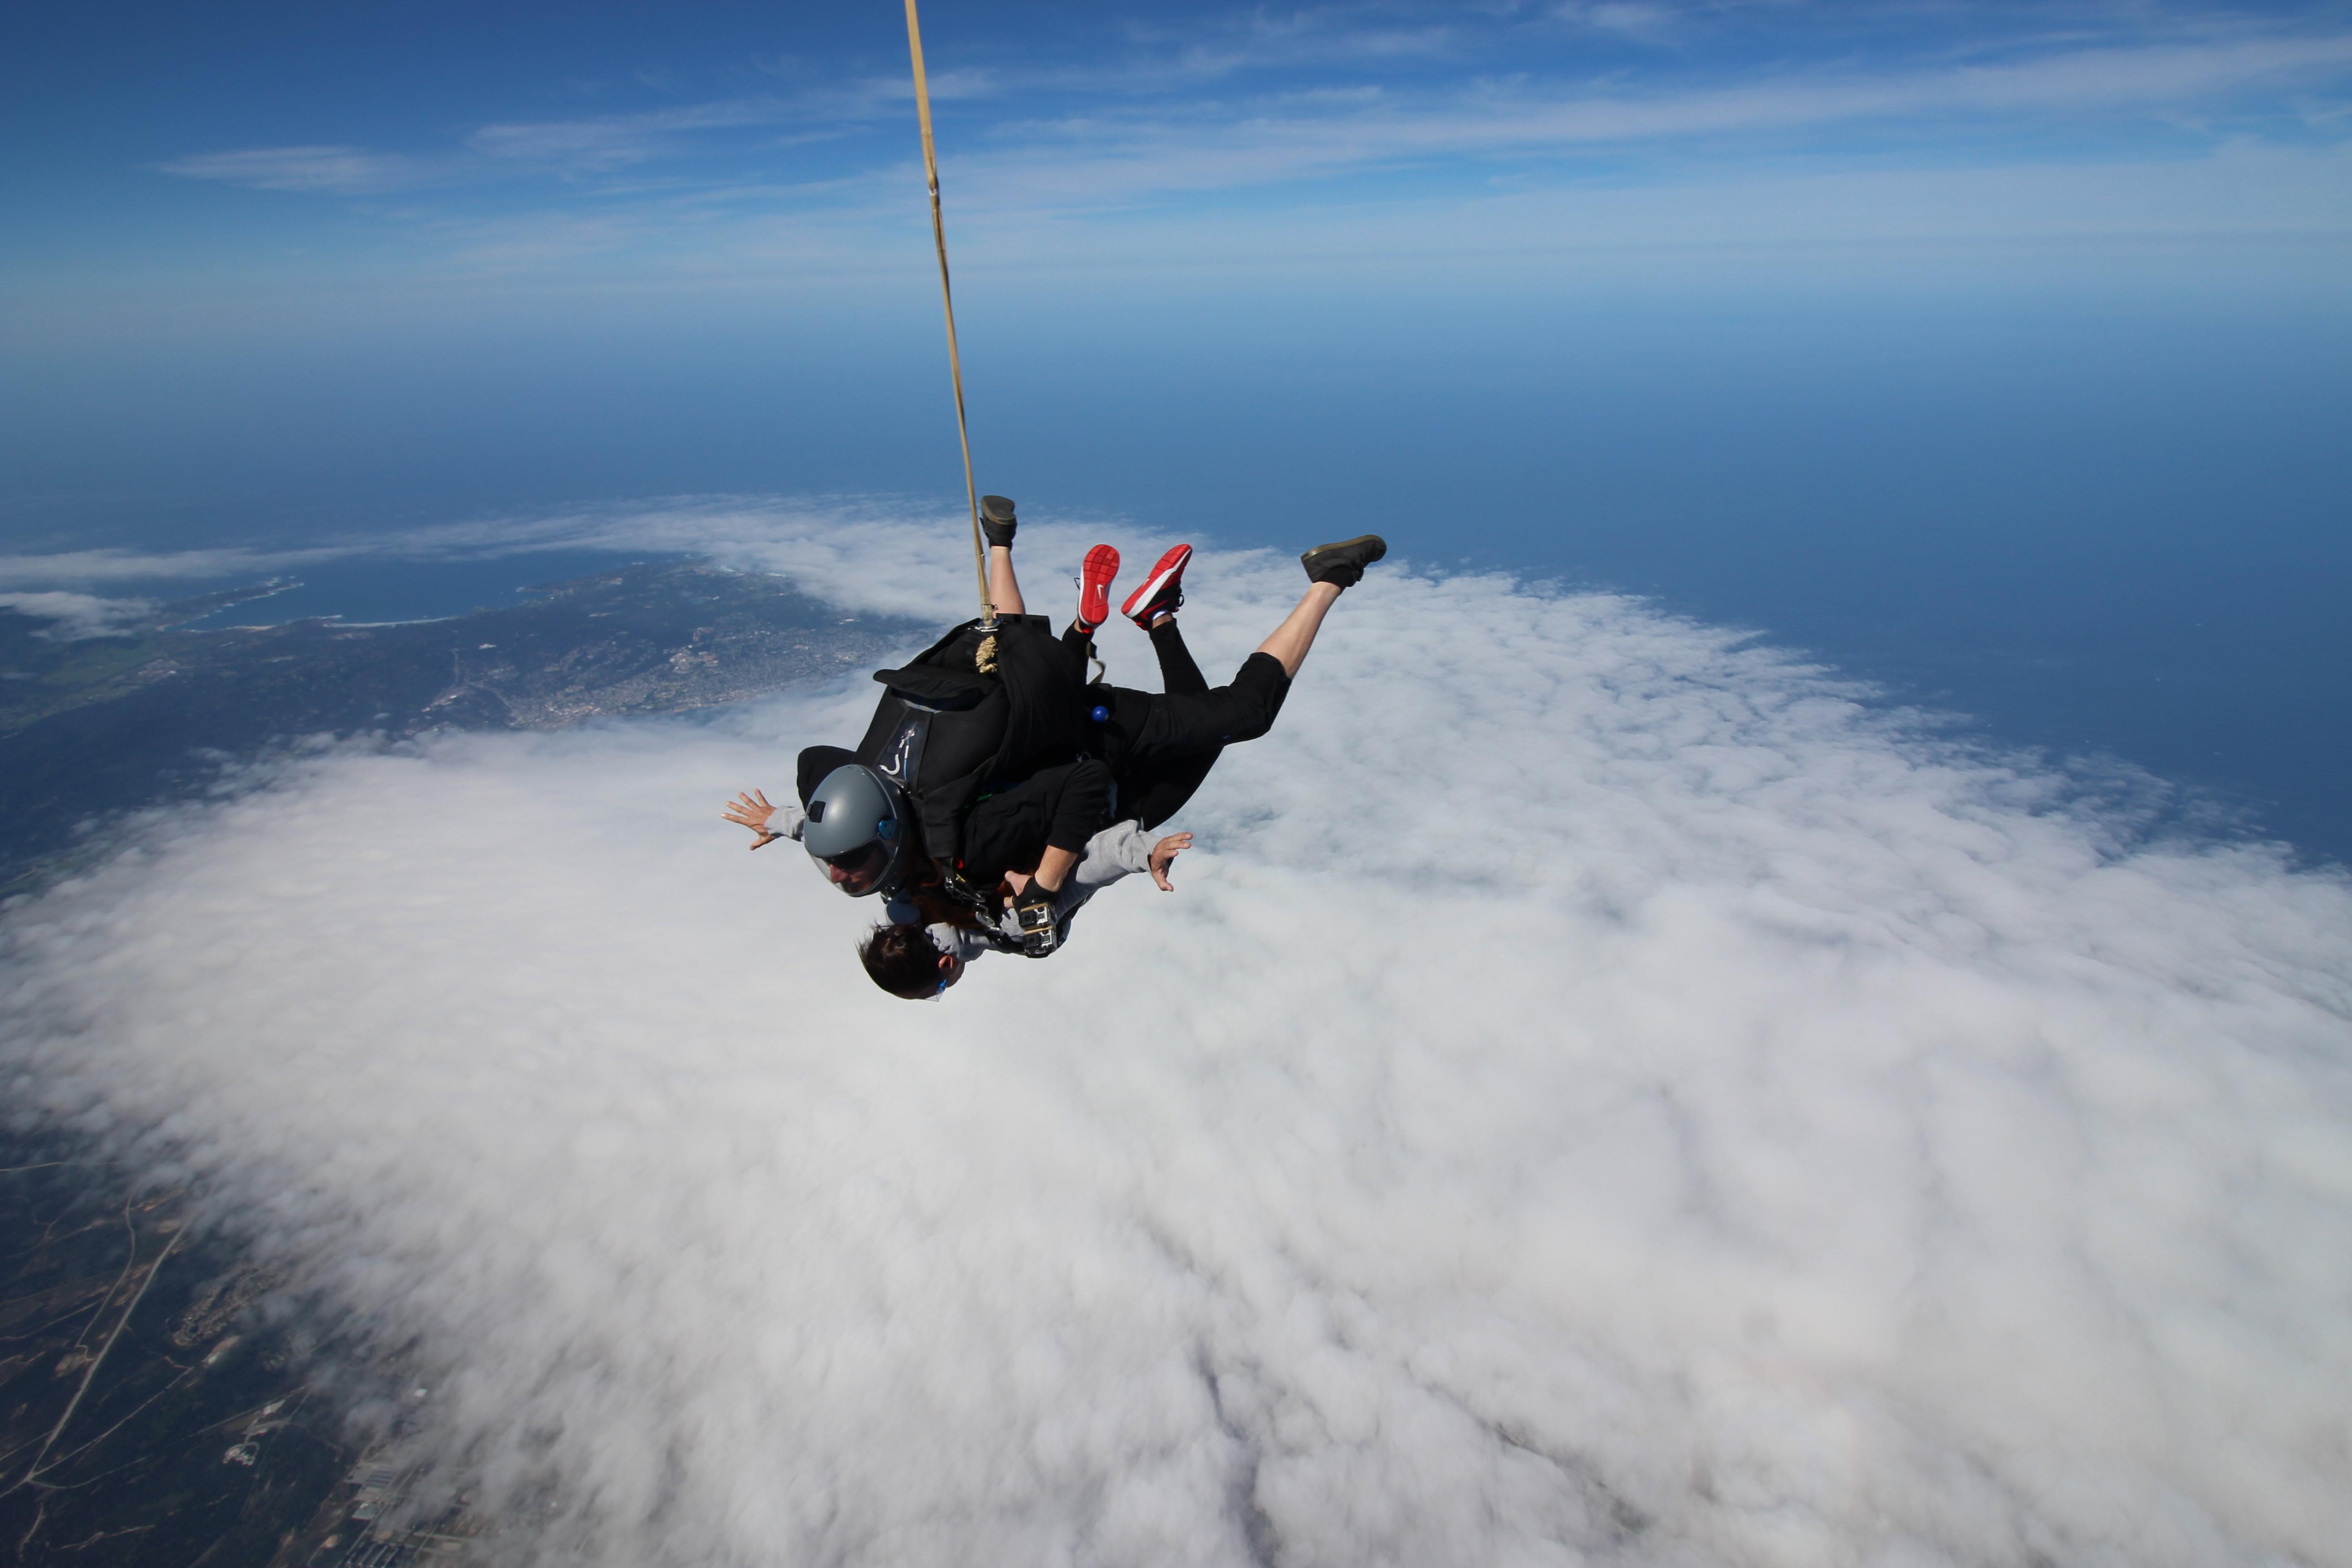 Monterey Date Idea for Adventurers: World's Highest Tandem Jump at Skydive Monterey Bay